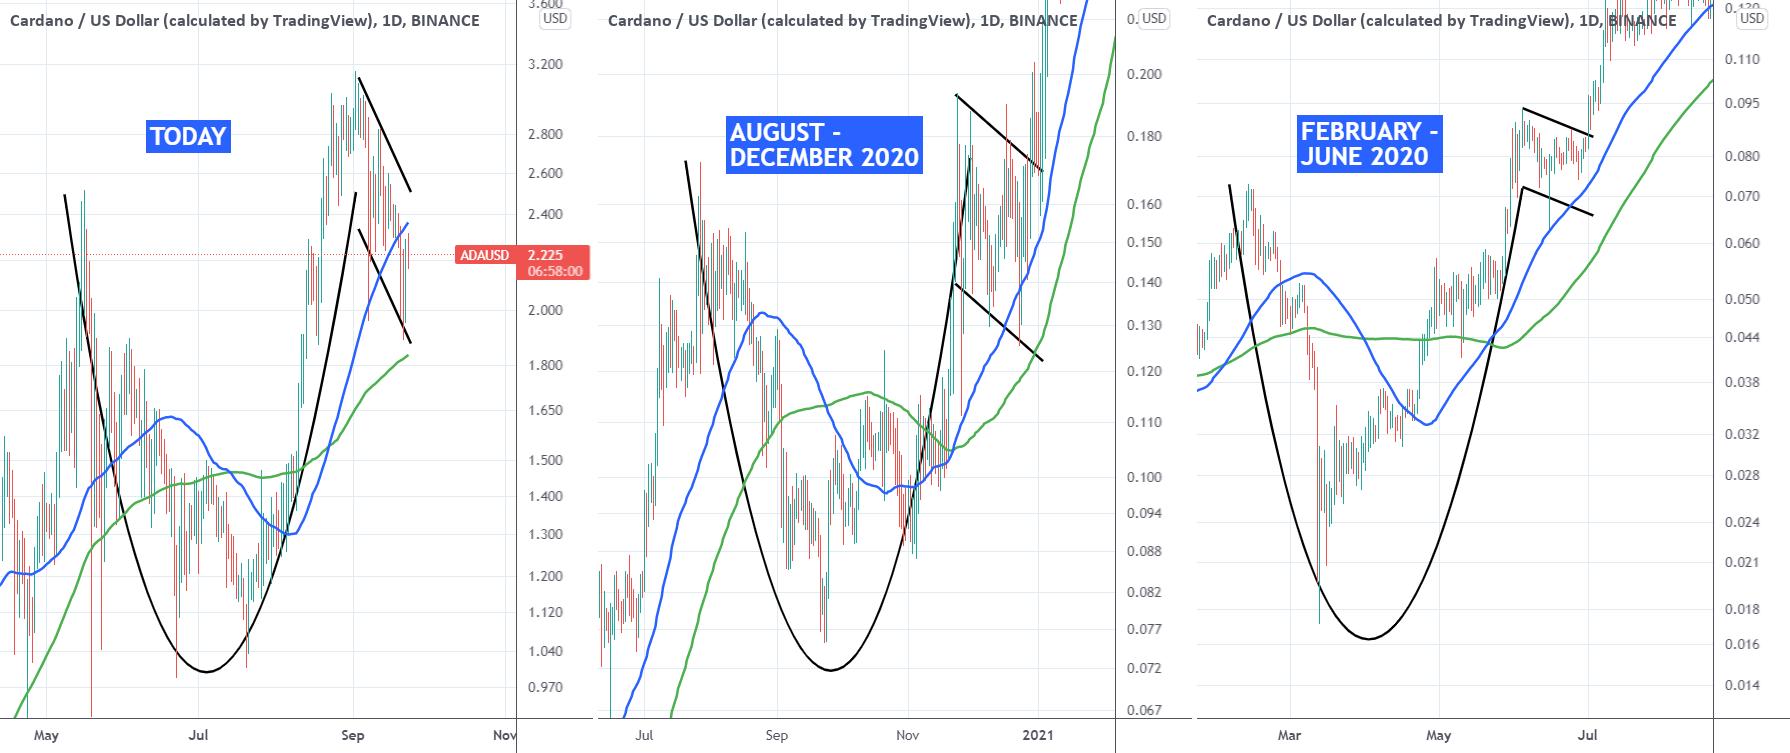 What's cardano (ADA) price prediction?